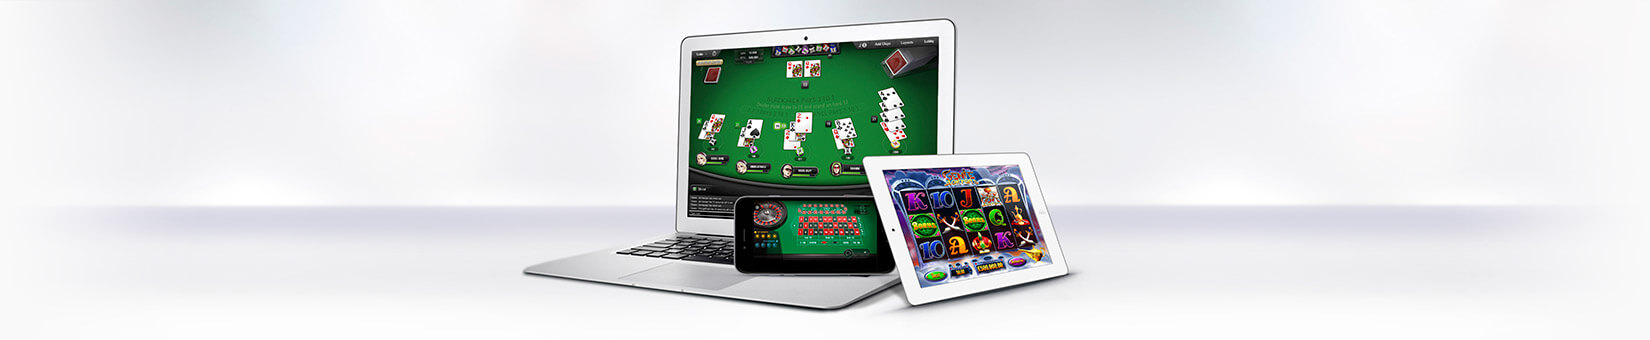 Poker download pc - 54433